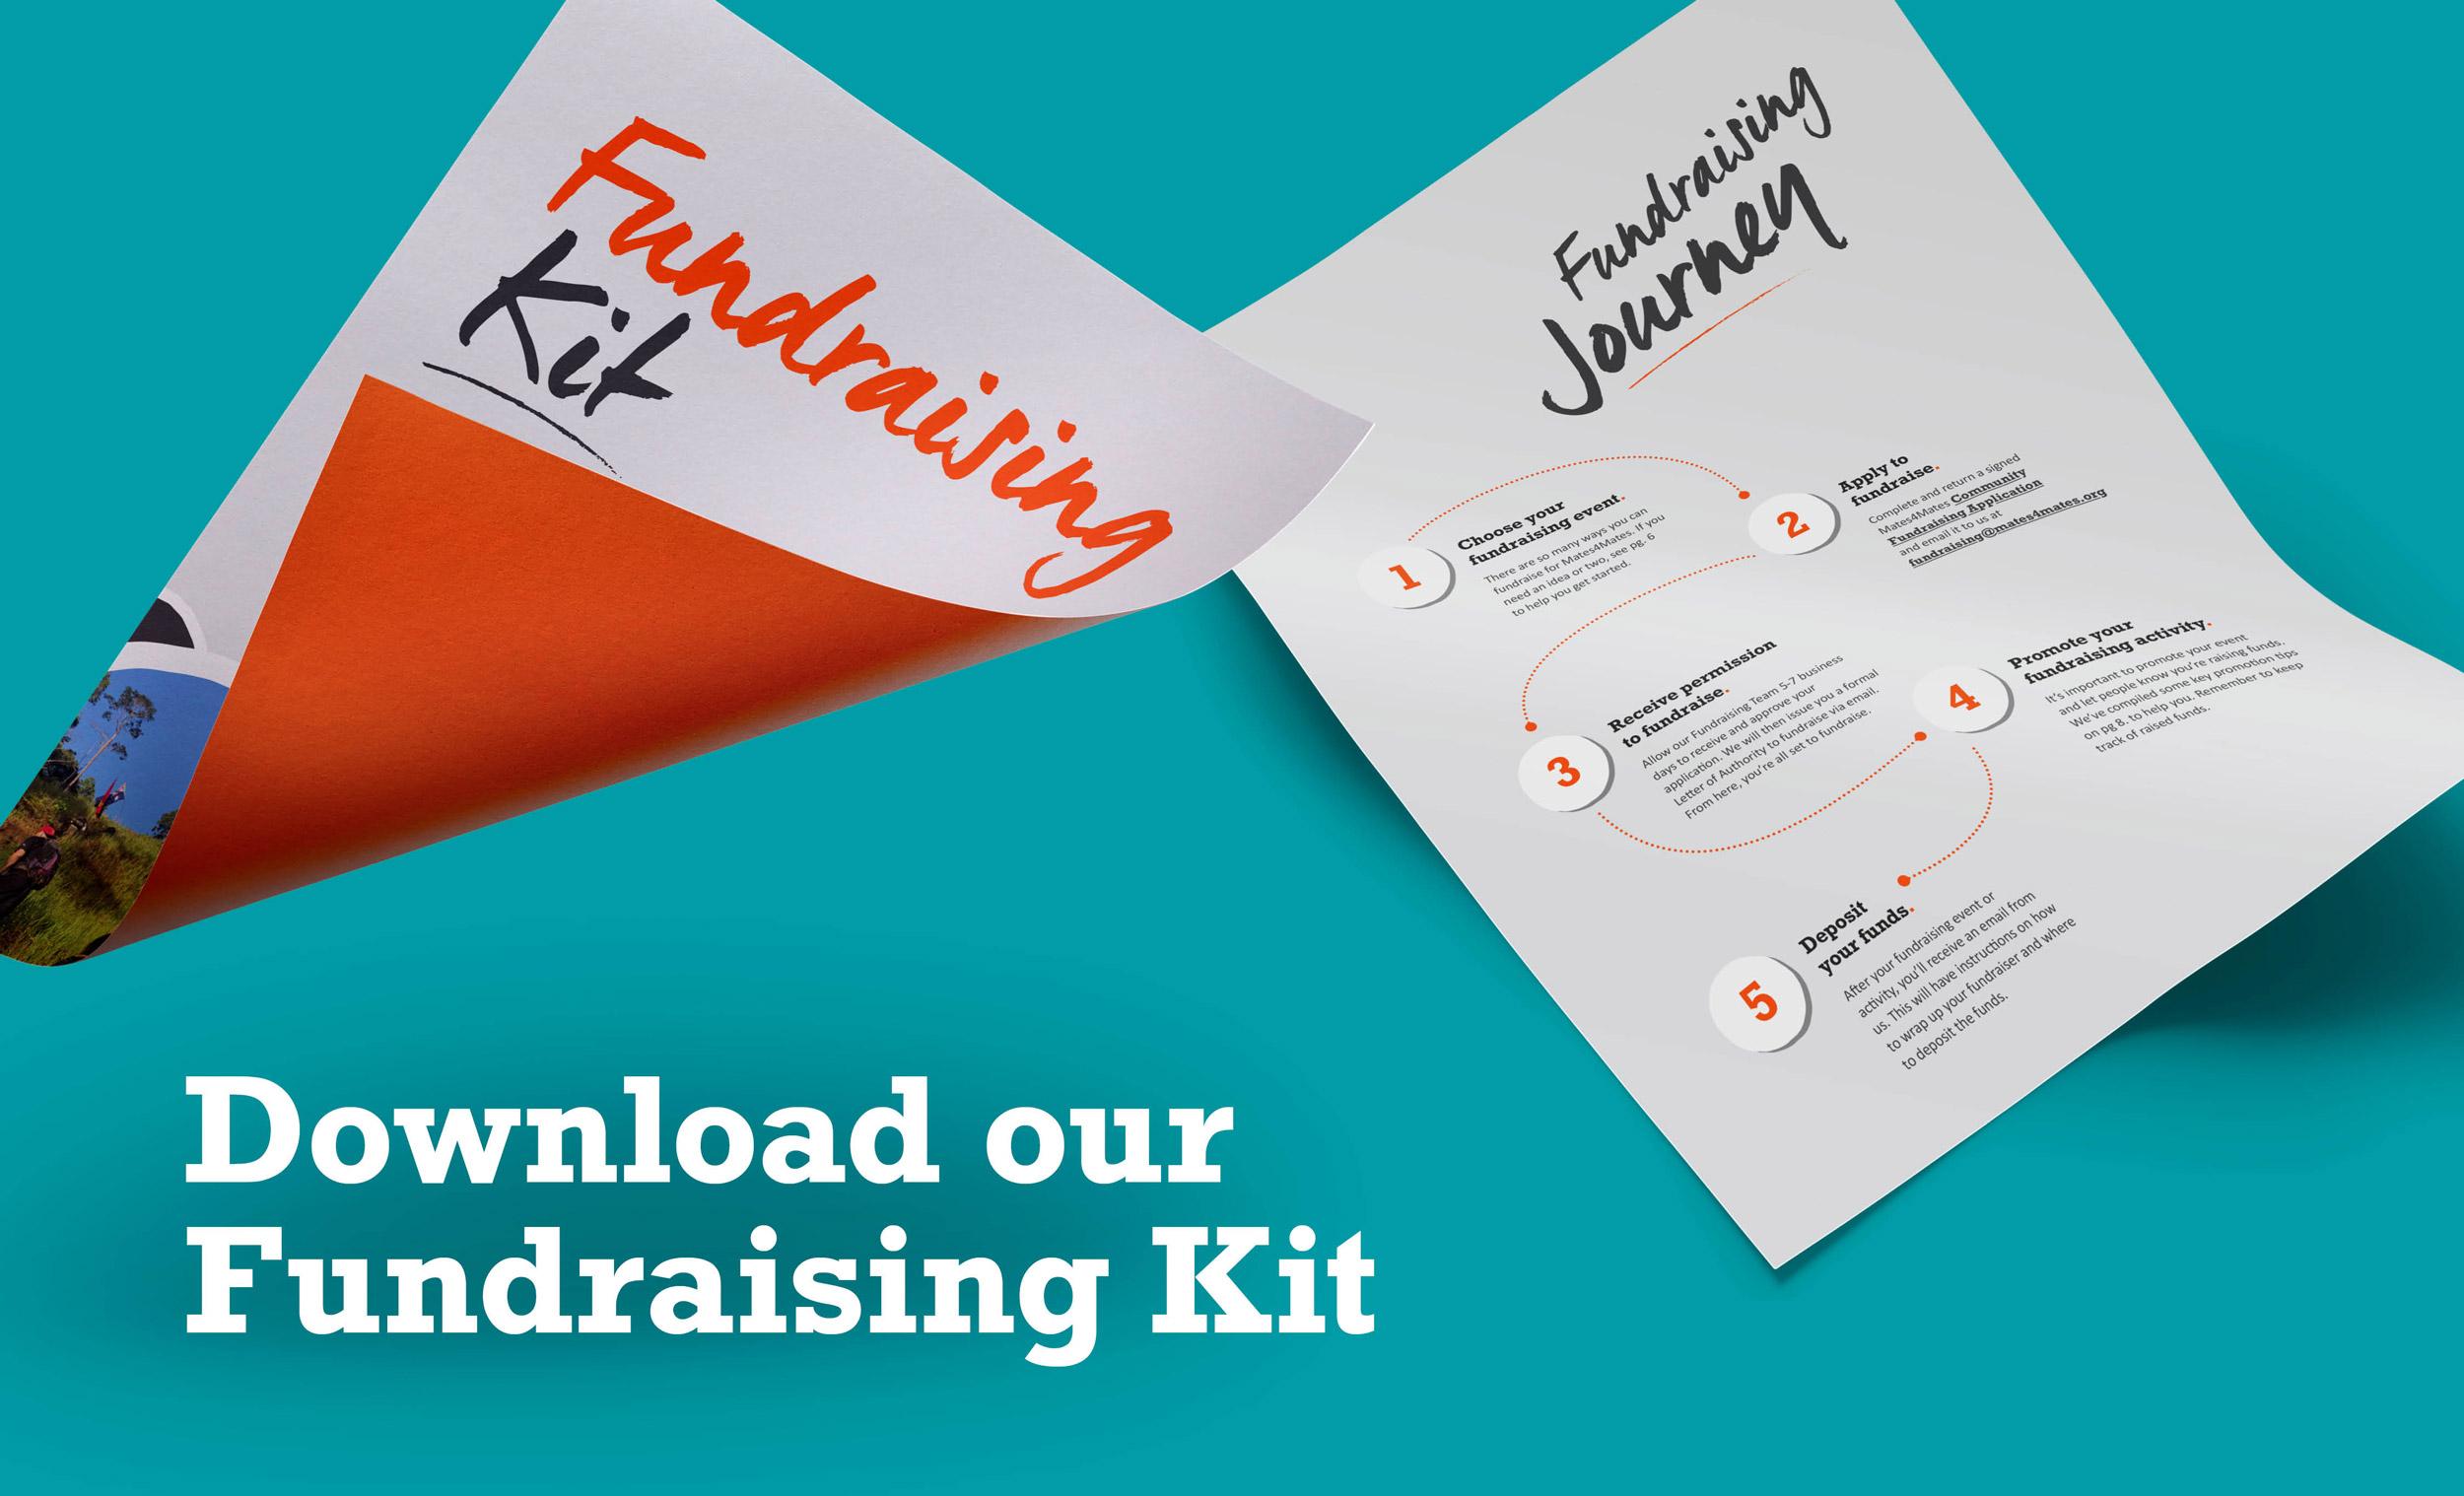 download-fundraising-kit.jpg